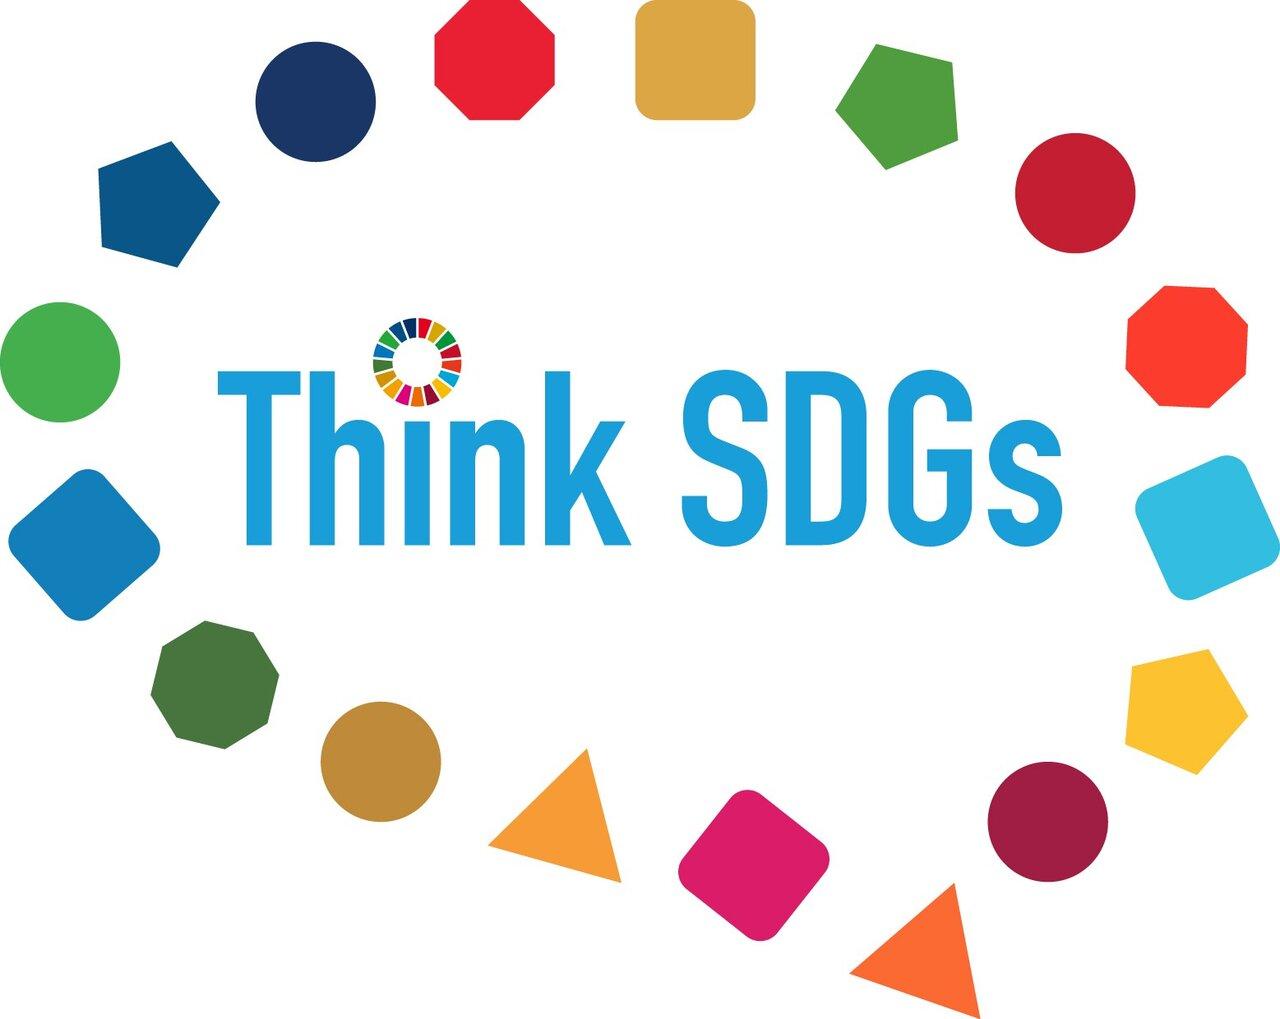 Think SDGs